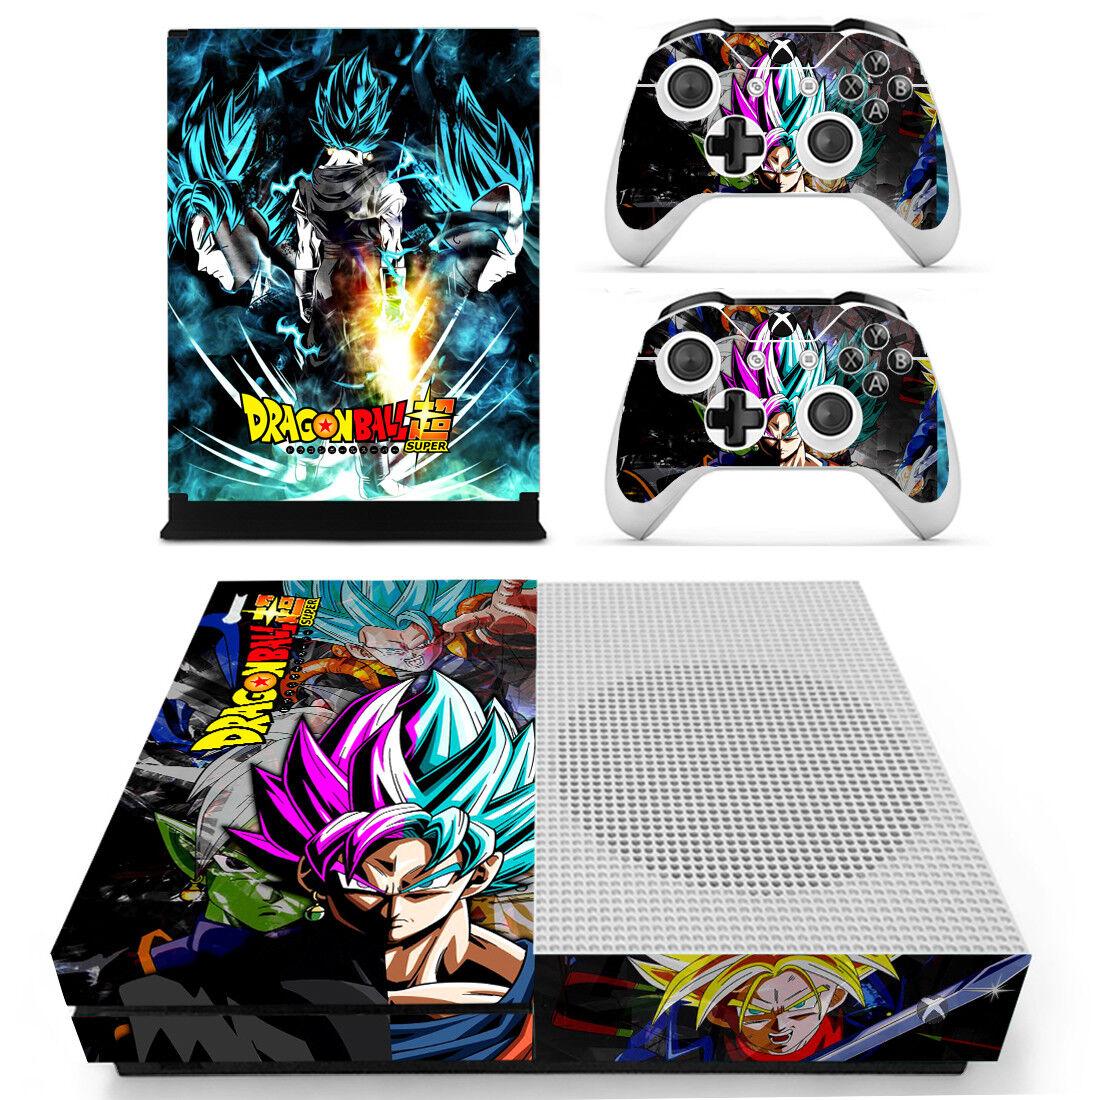 Xbox One S Slim Dragon Ball Z DBZ Goku Saiyan Vinyl Skin Dec